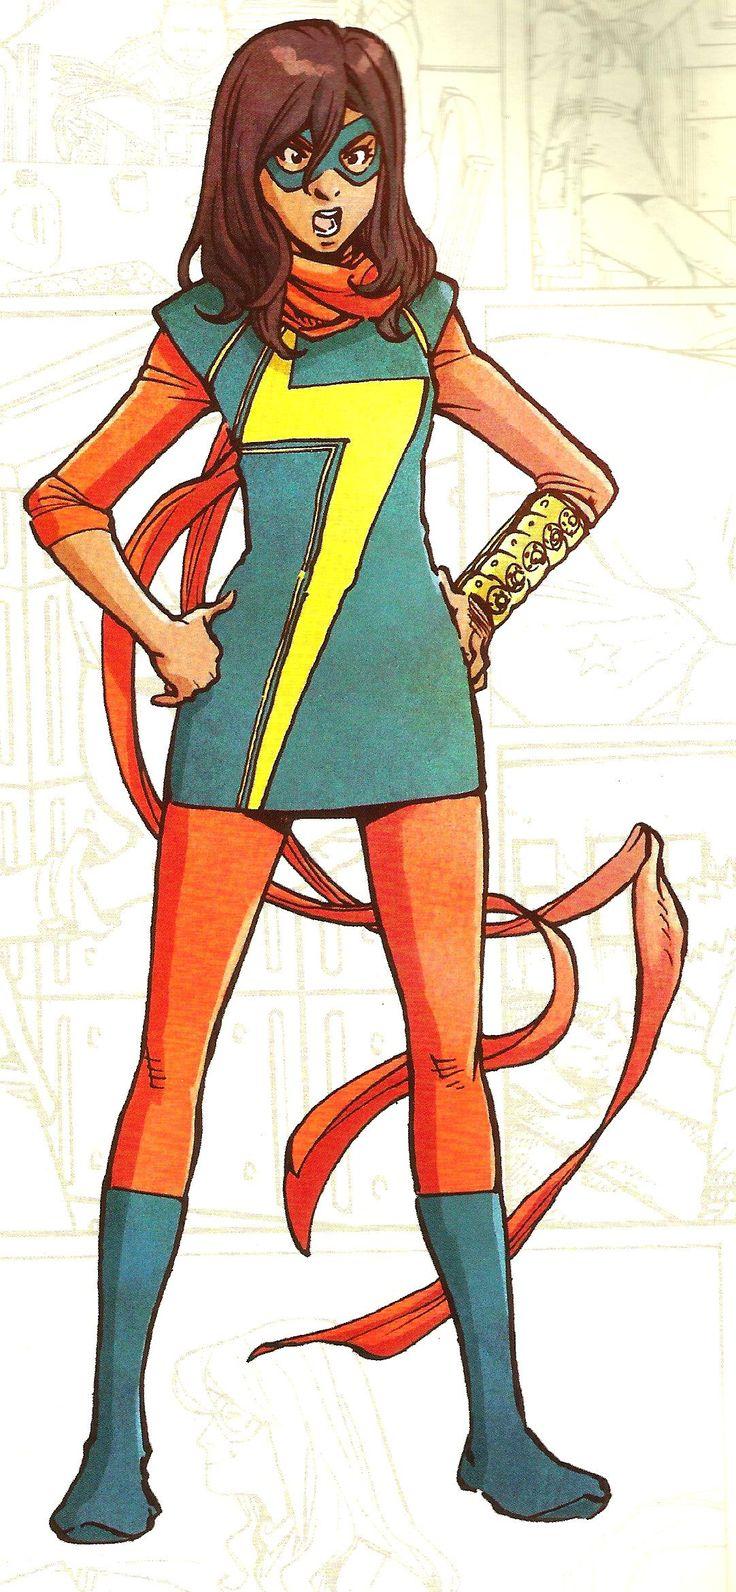 Ms. Marvel, alias Kamala Khan, tecknad av Takeshi Miyazawa.